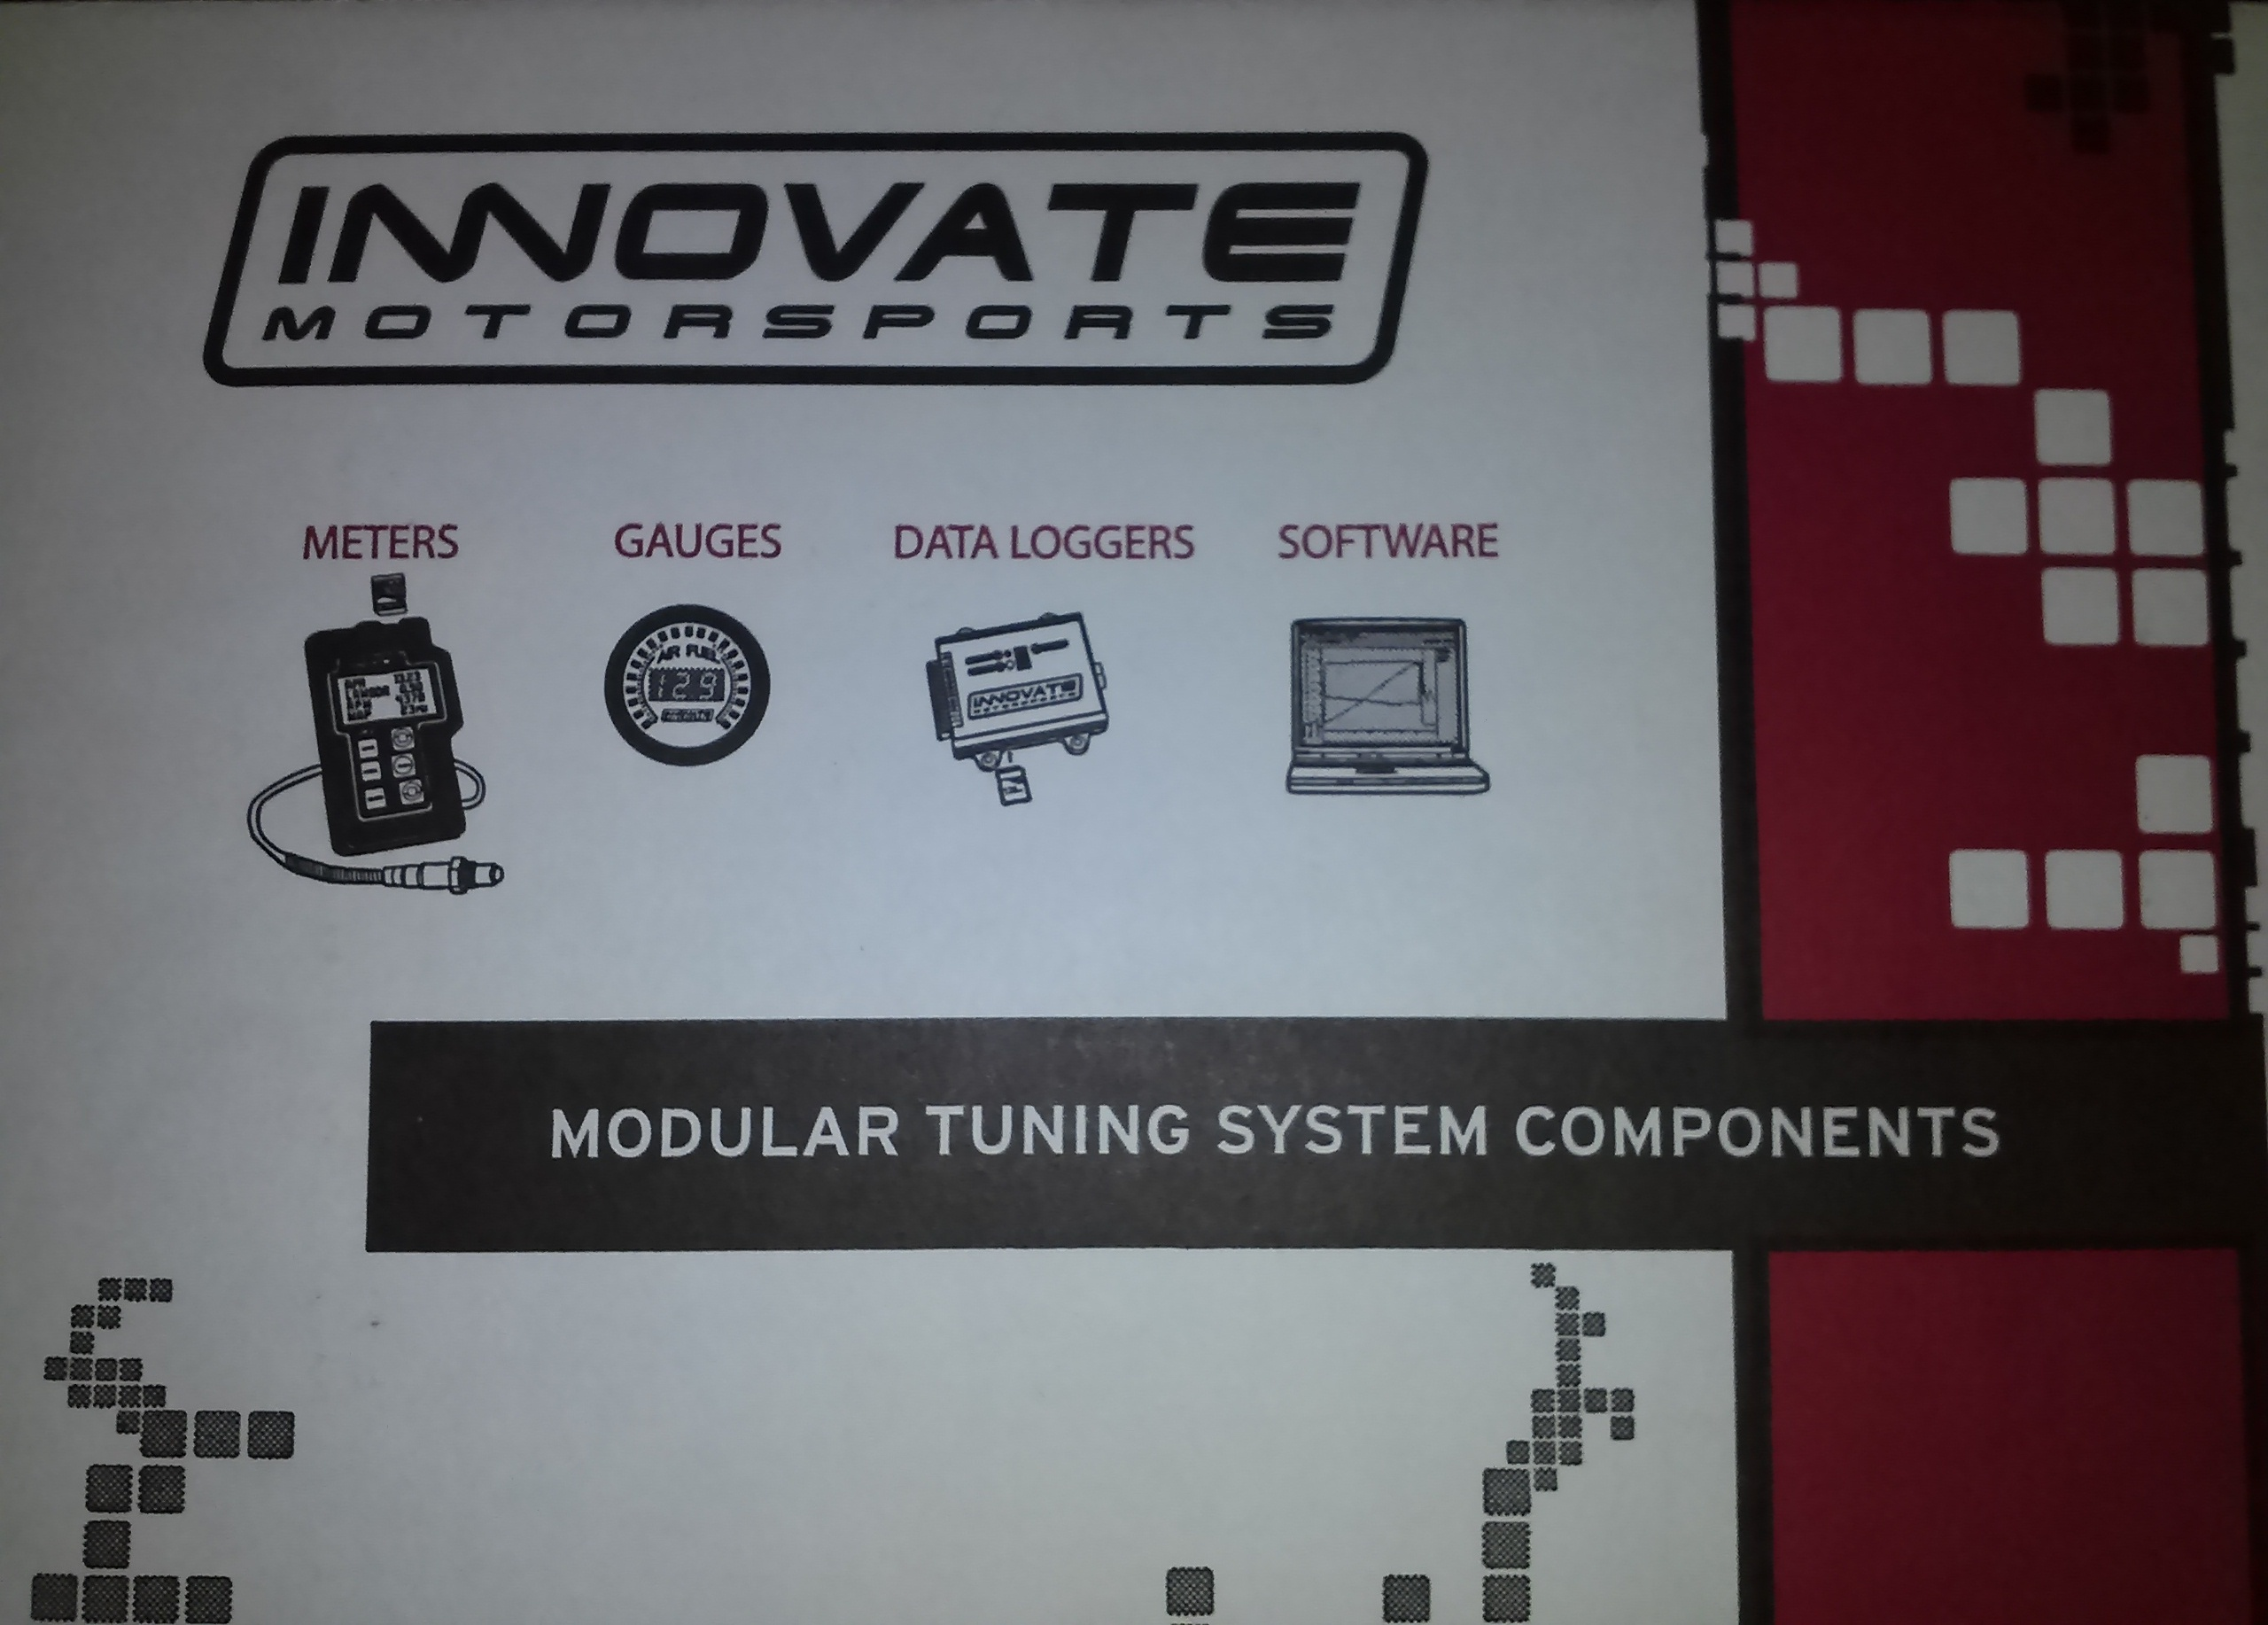 Innovate MTX-L AFR Gauge w/O2 Sensor   Twos R Us